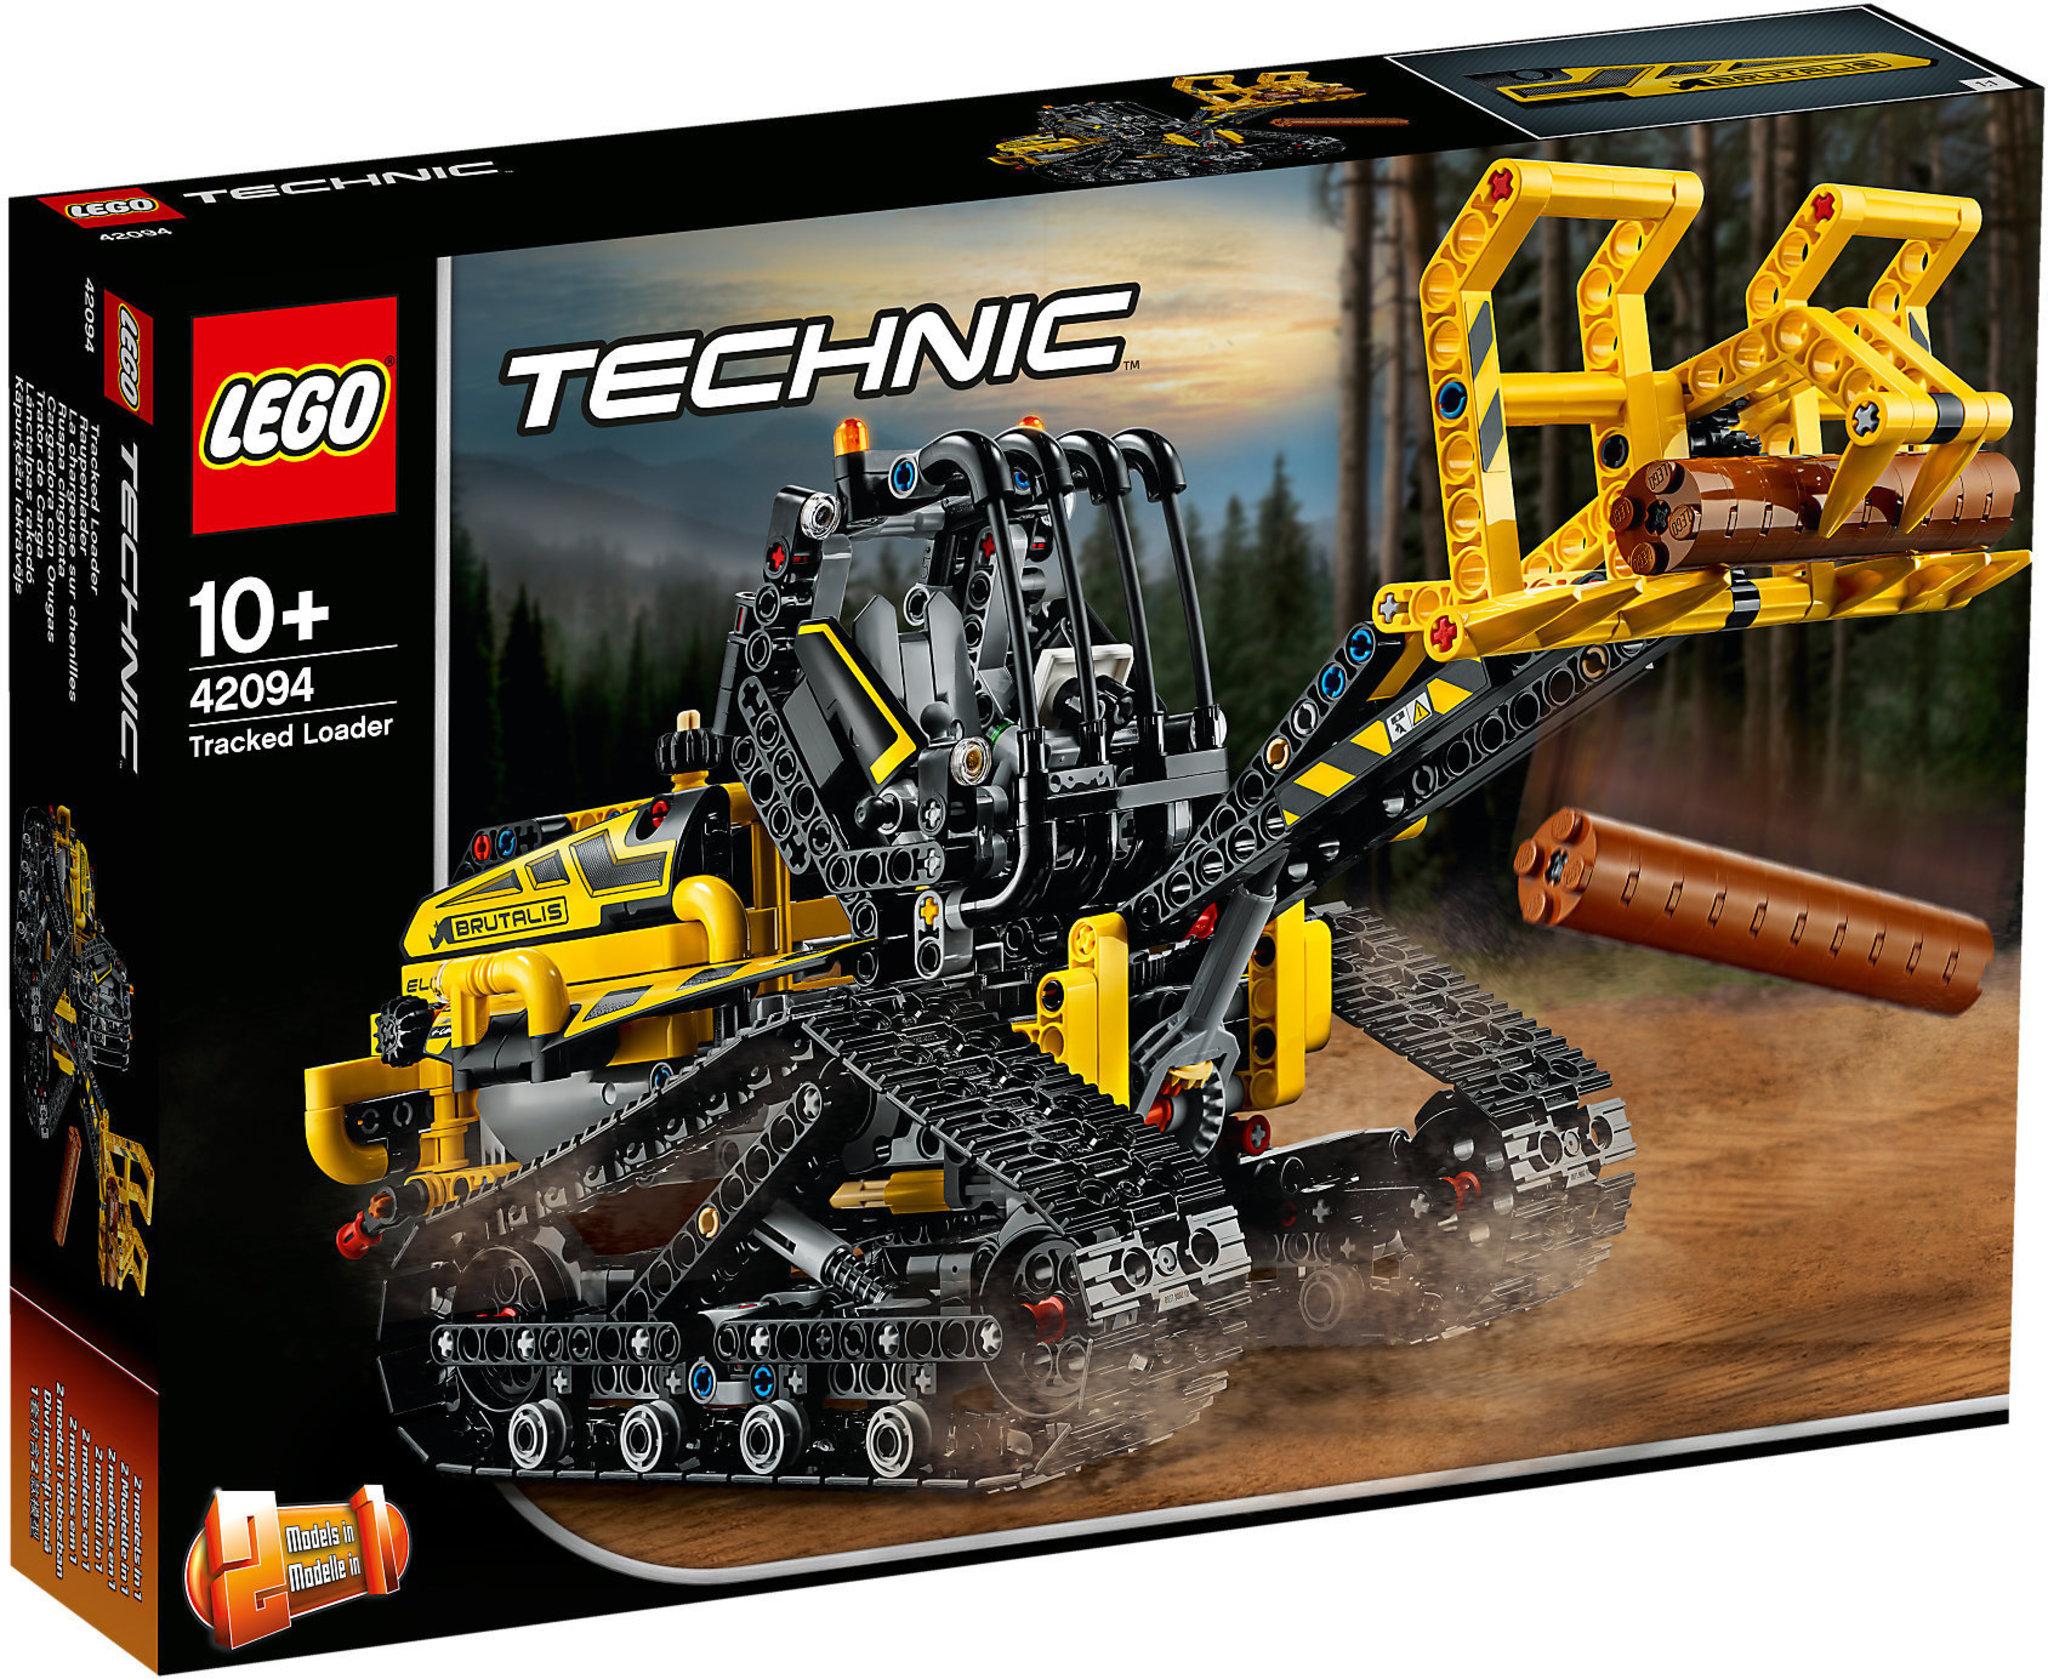 LEGO Technic 42094 - Tracked Loader